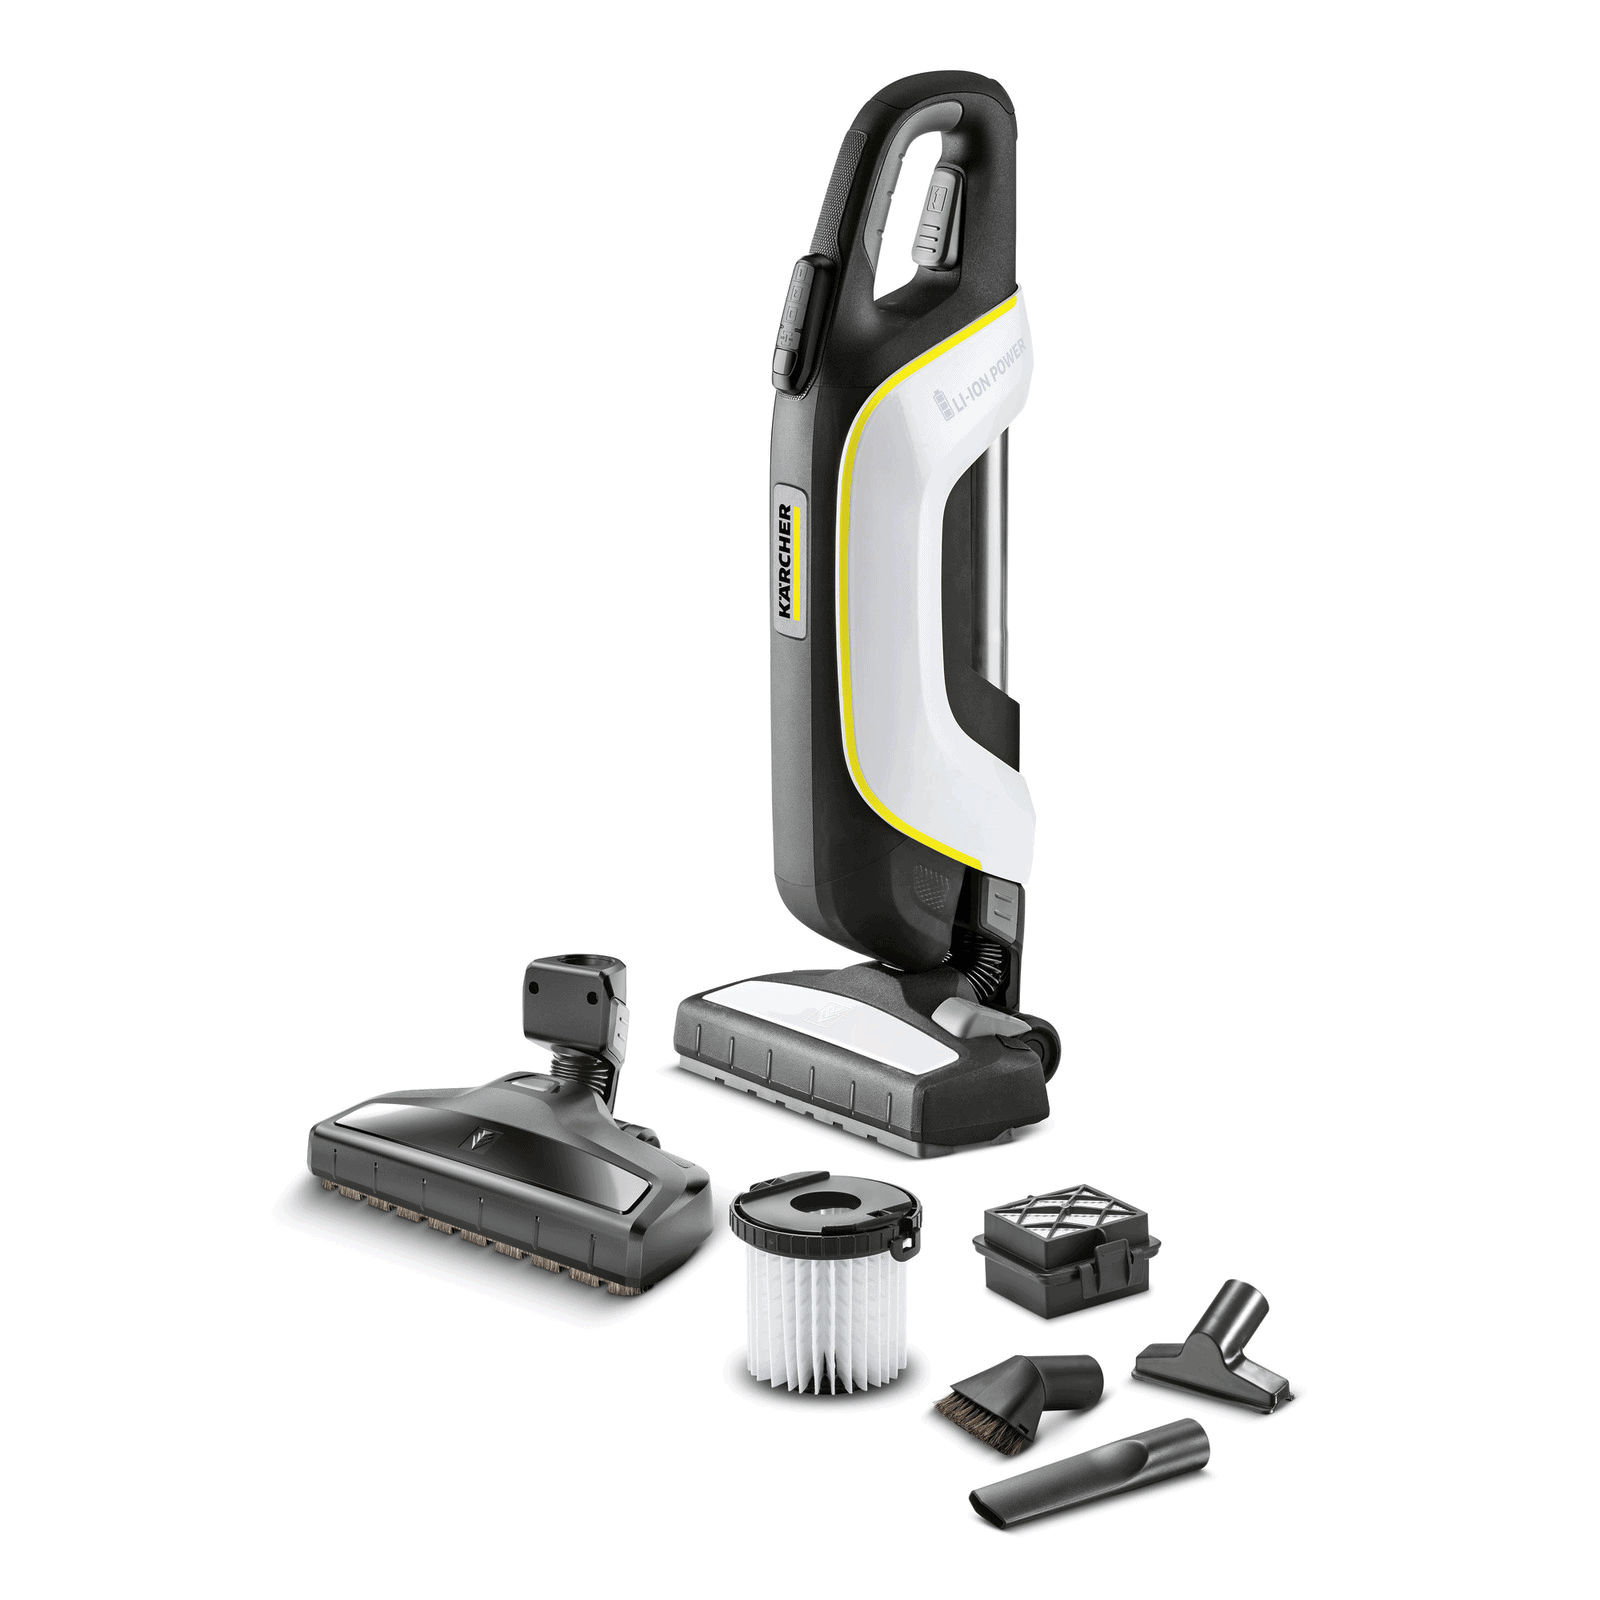 budget handheld cordless vacuum cleaner singapore